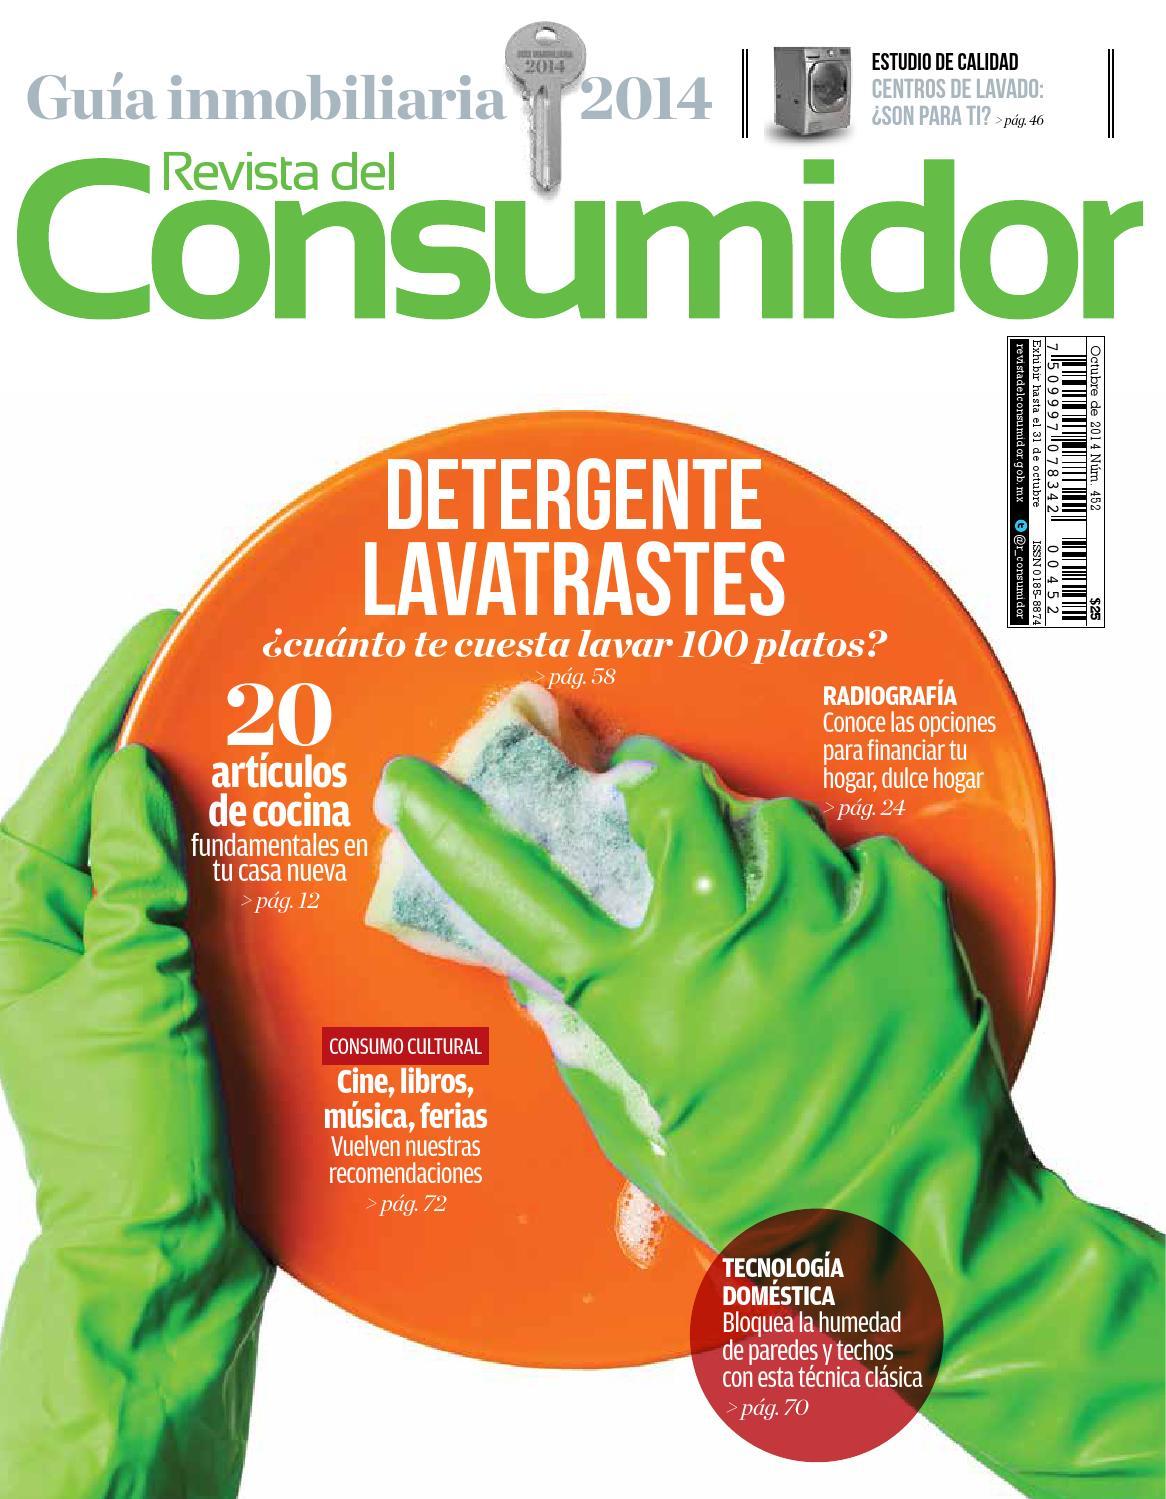 Revista del Consumidor 2014 octubre Ed. 452 by PROFECO - issuu